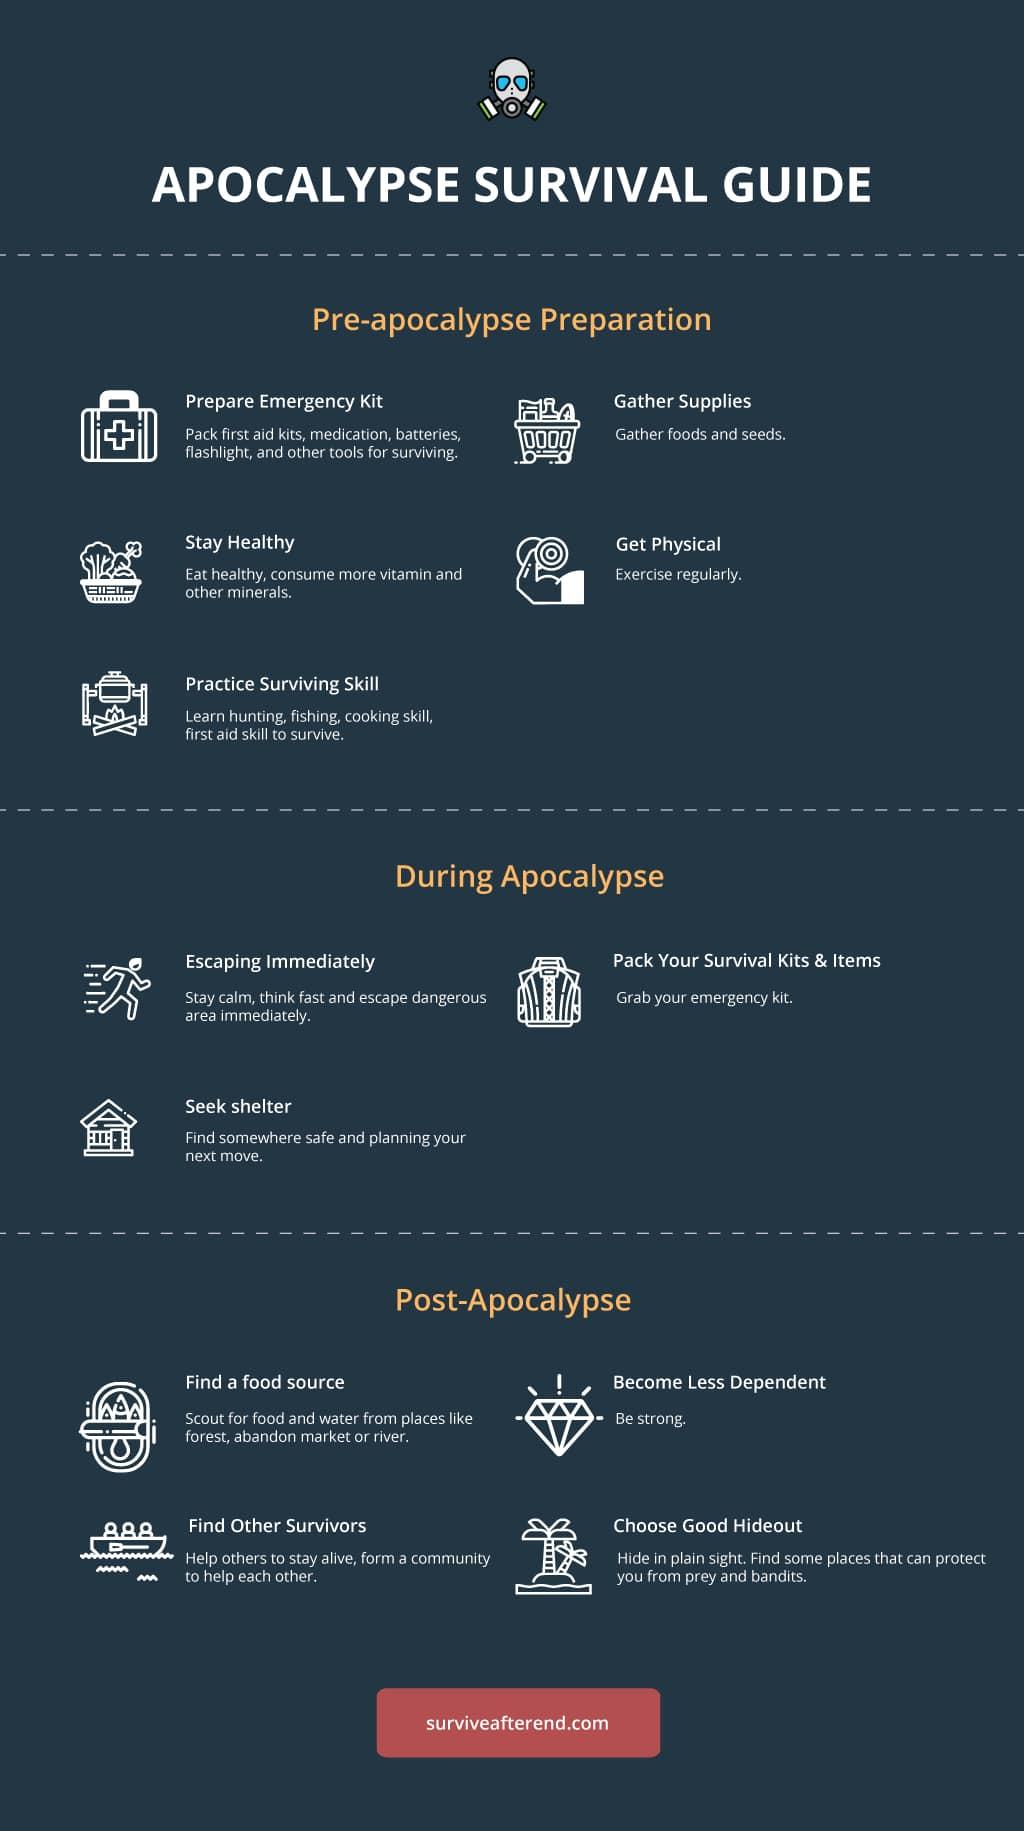 Apocalypse Survival Guide